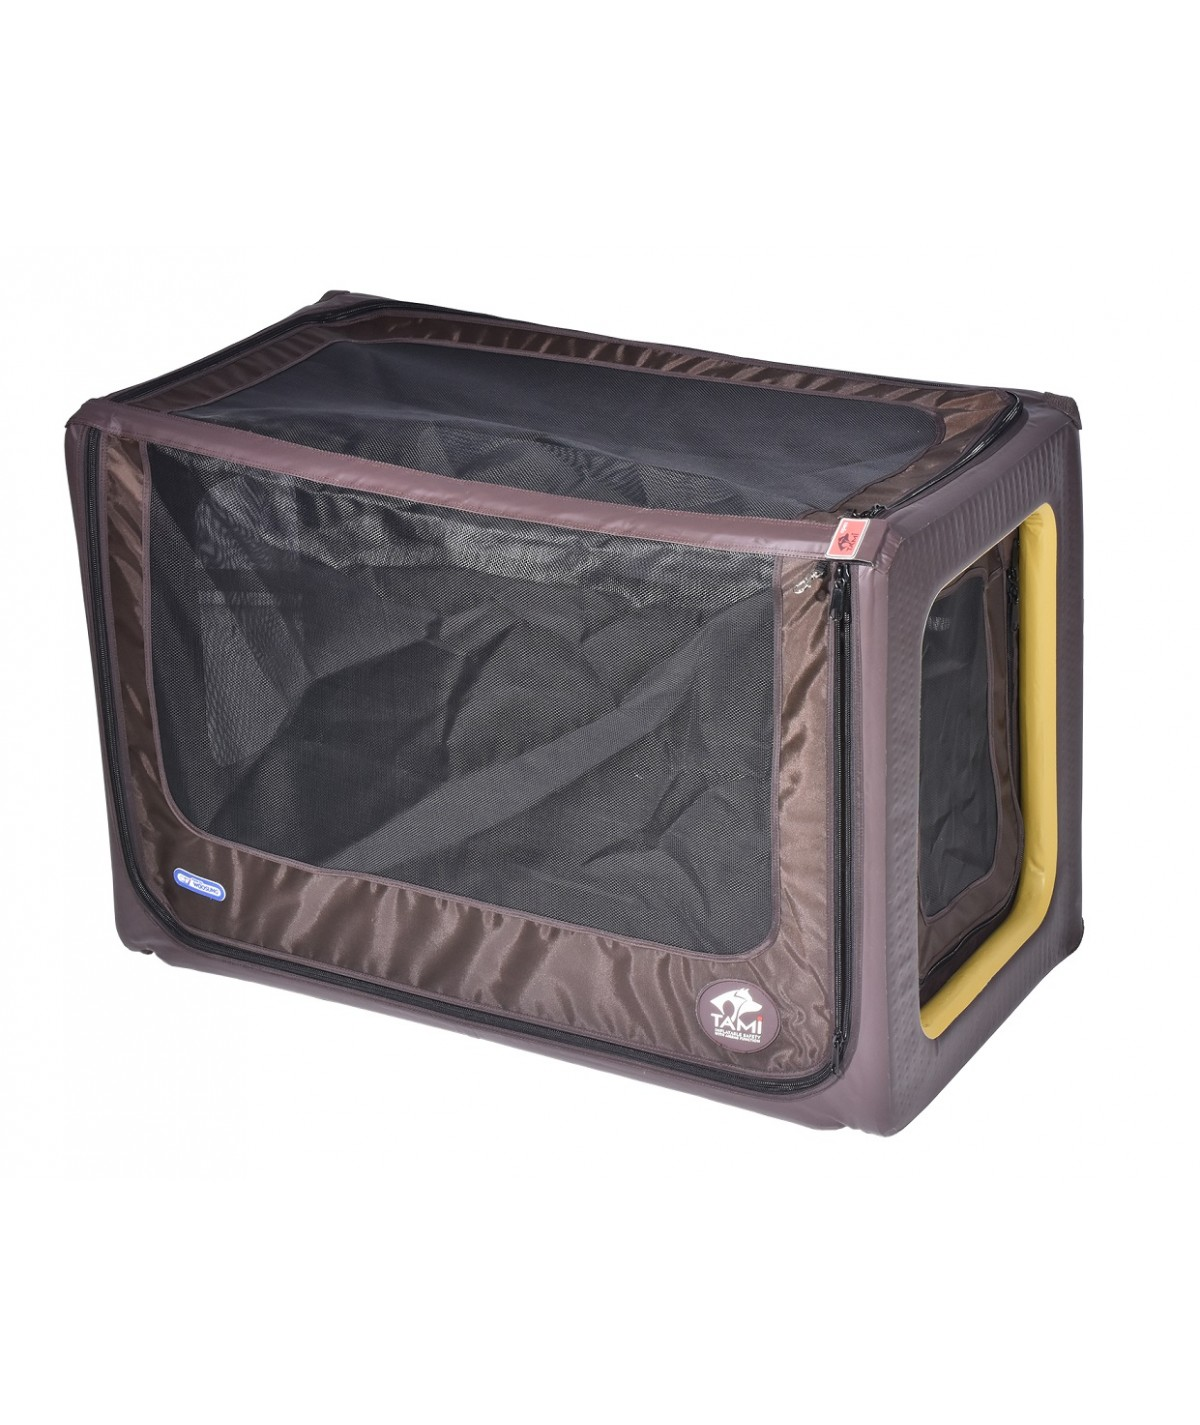 Tami Dogbox Backseat Größe L